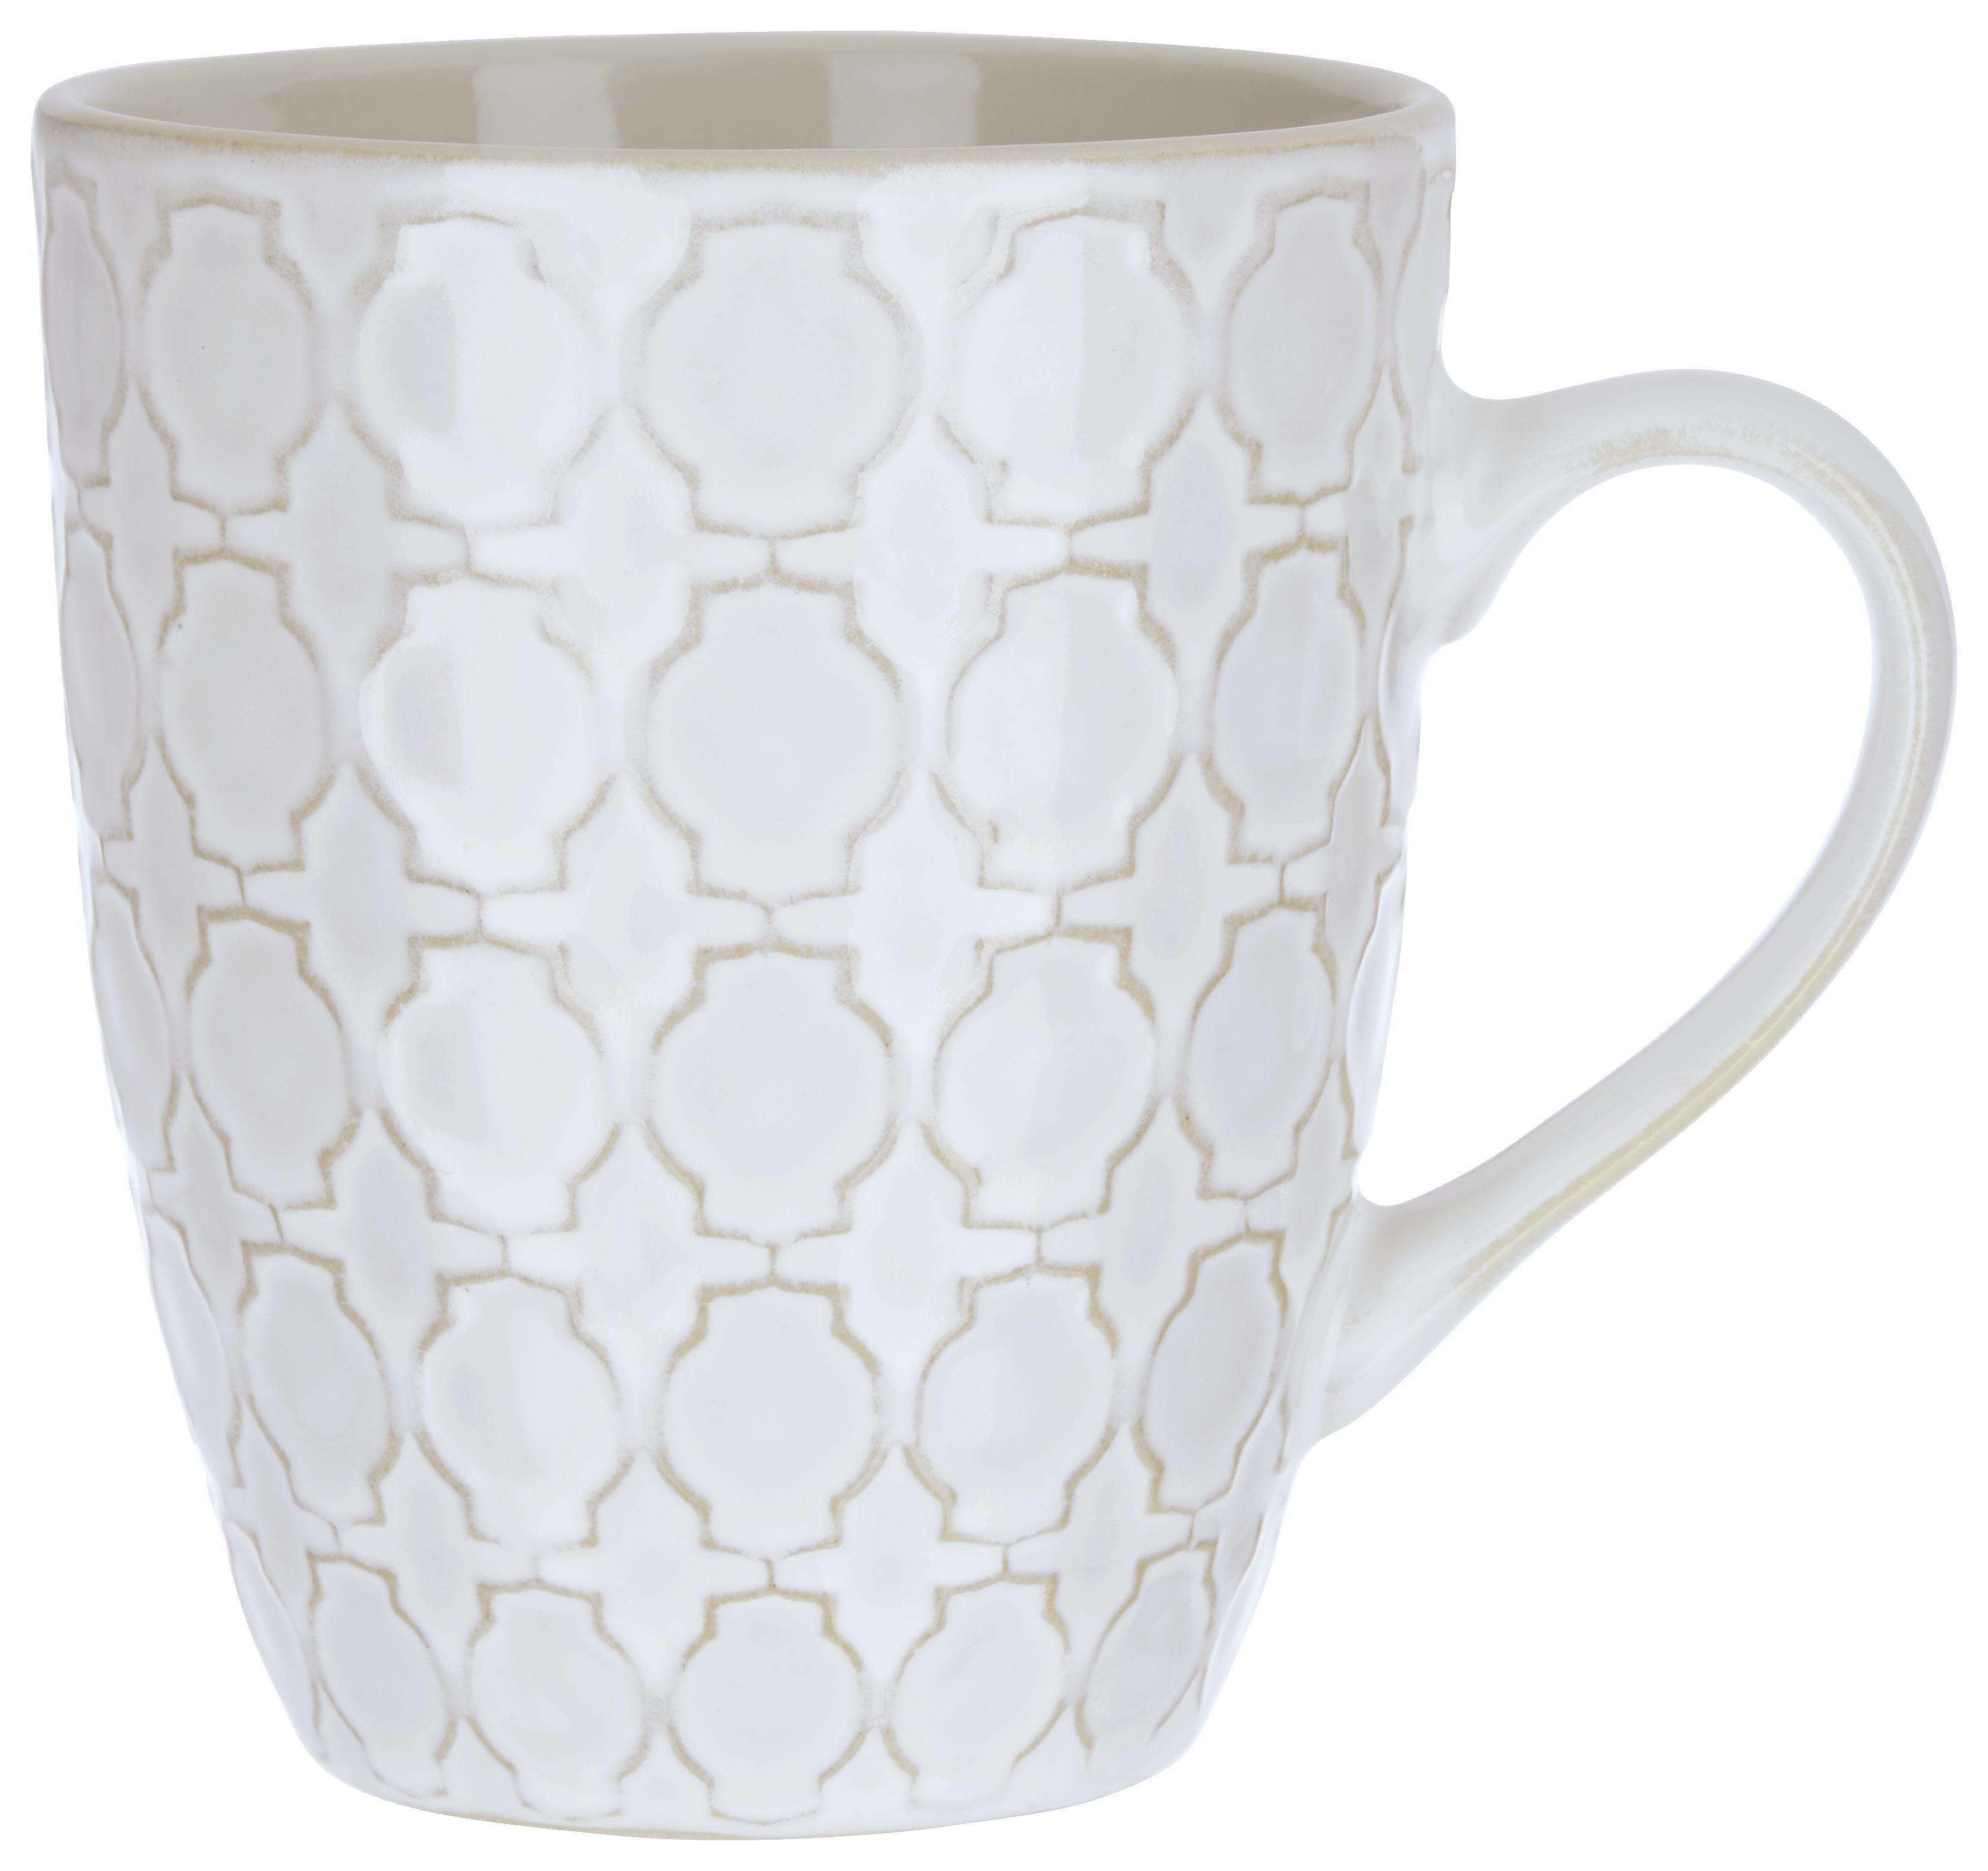 Kaffeebecher Riley in Naturfarben - Naturfarben, LIFESTYLE, Keramik (9,1/10,9cm) - MÖMAX modern living